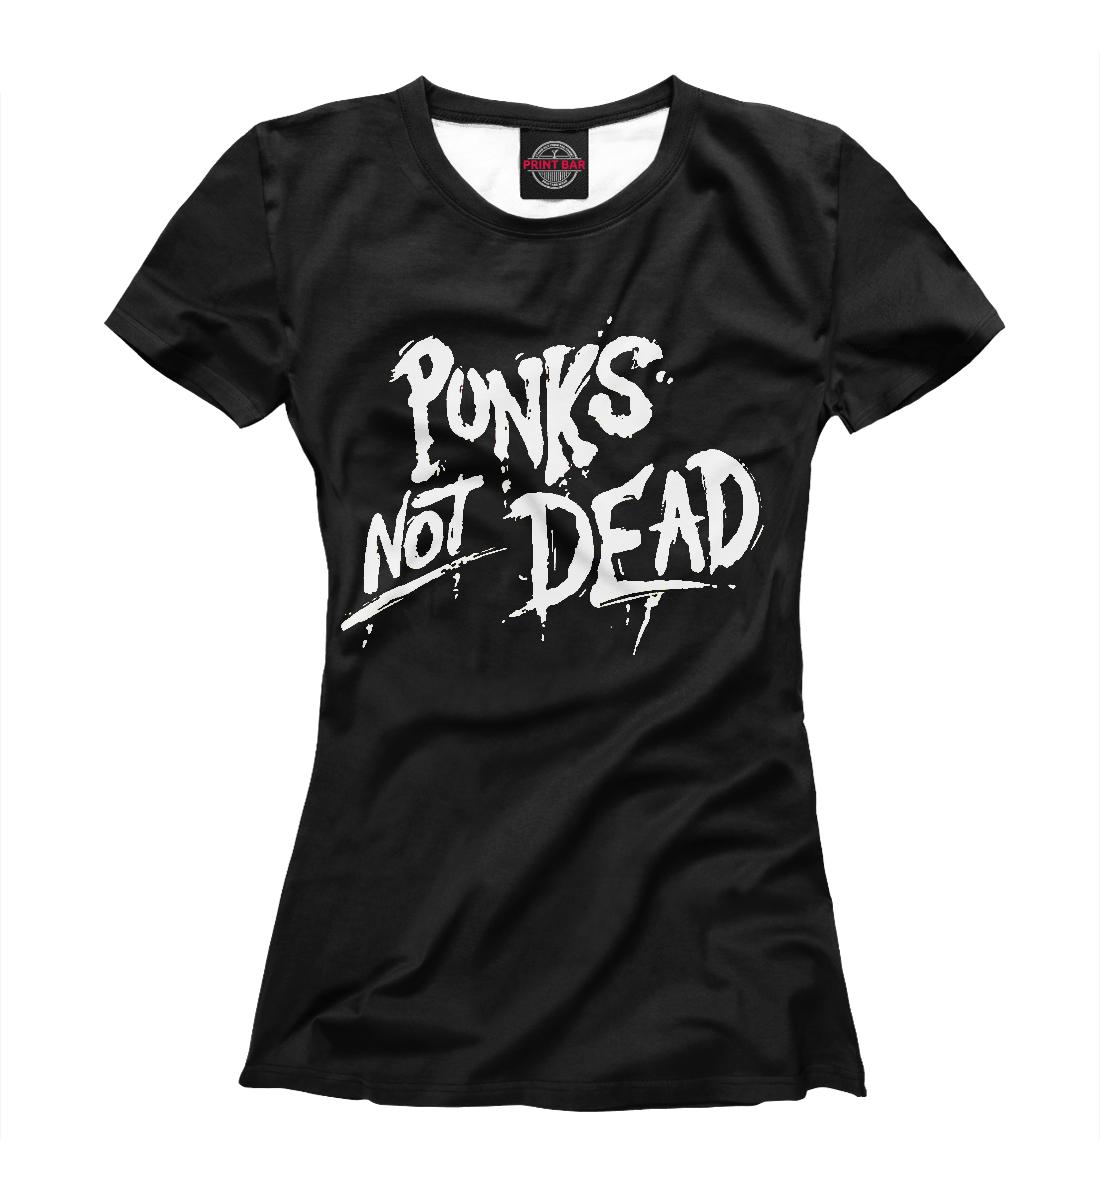 Купить The Exploited Punk's Not Dead, Printbar, Футболки, TEX-627836-fut-1